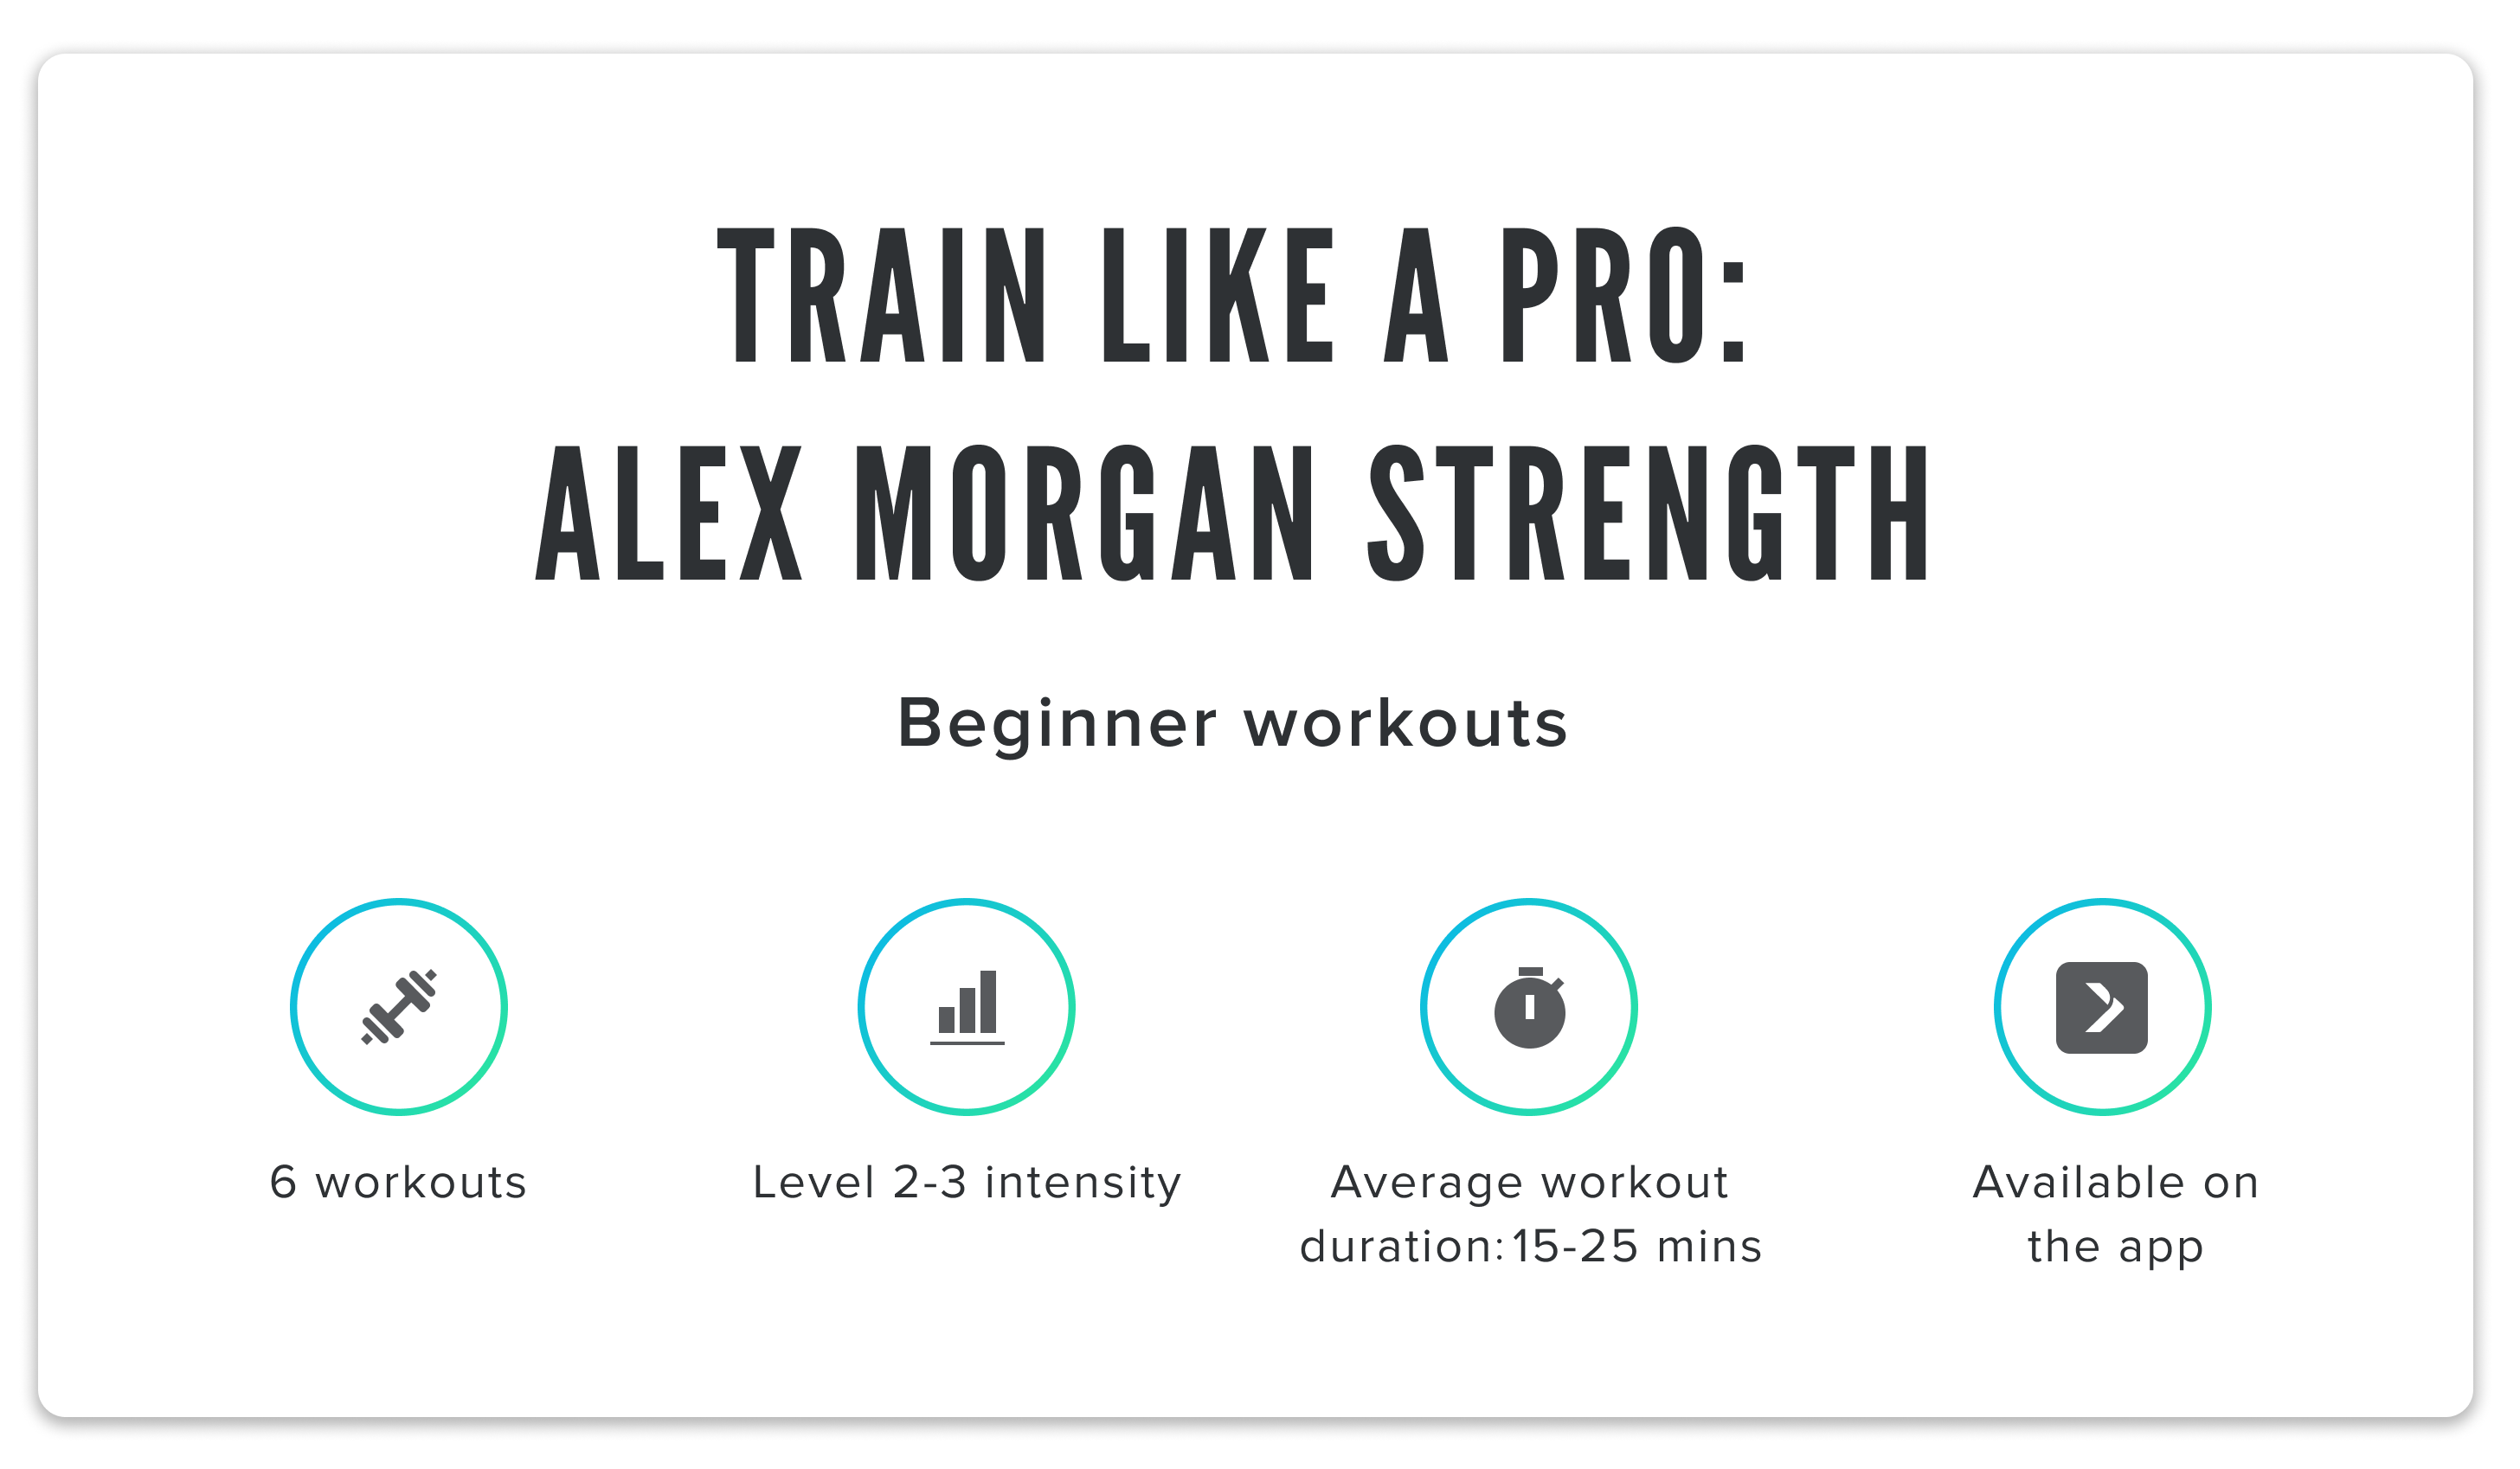 iFit Train Like a Pro: Alex Morgan strength classes